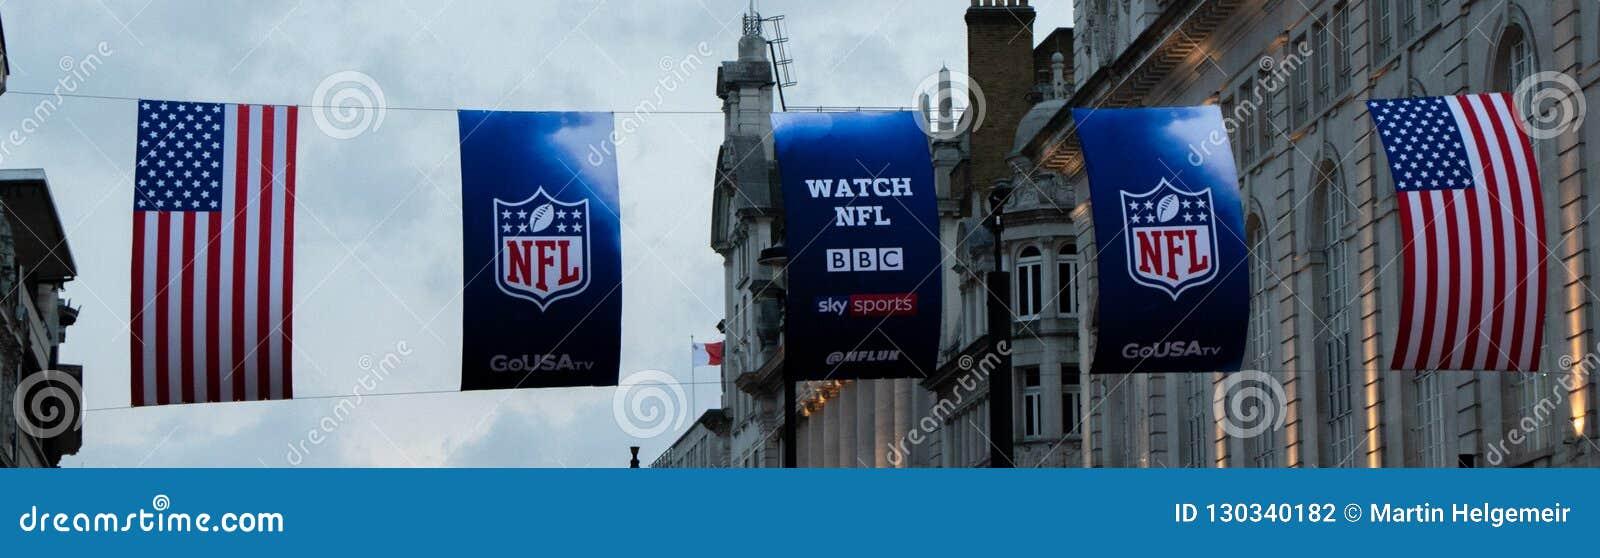 USA och NFL-flagga i London på Piccadilly Circus